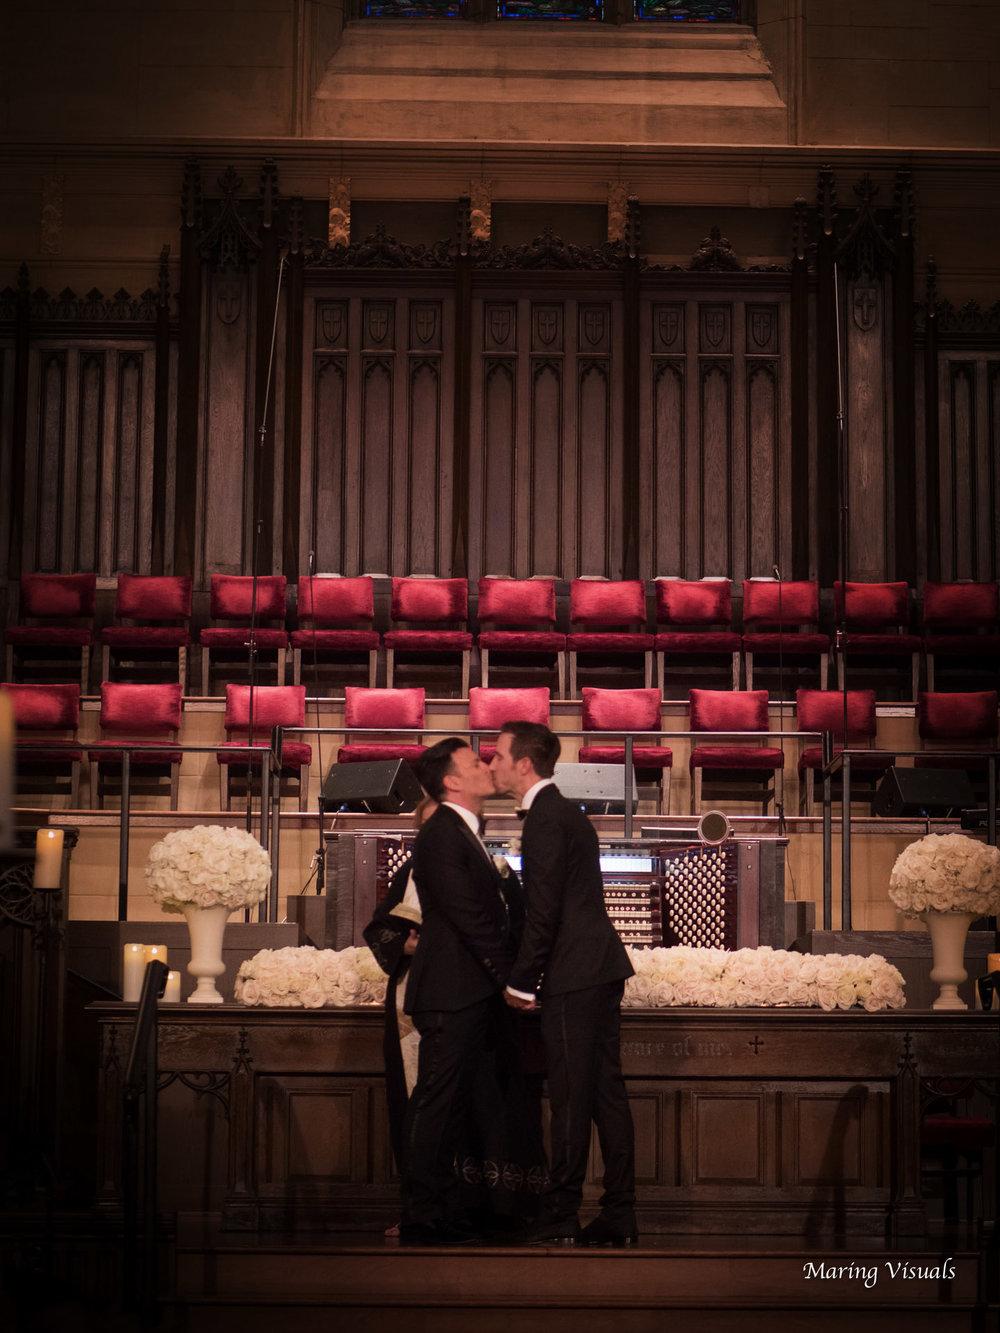 David Tutera Weddings by Maring Visuals 00535.jpg